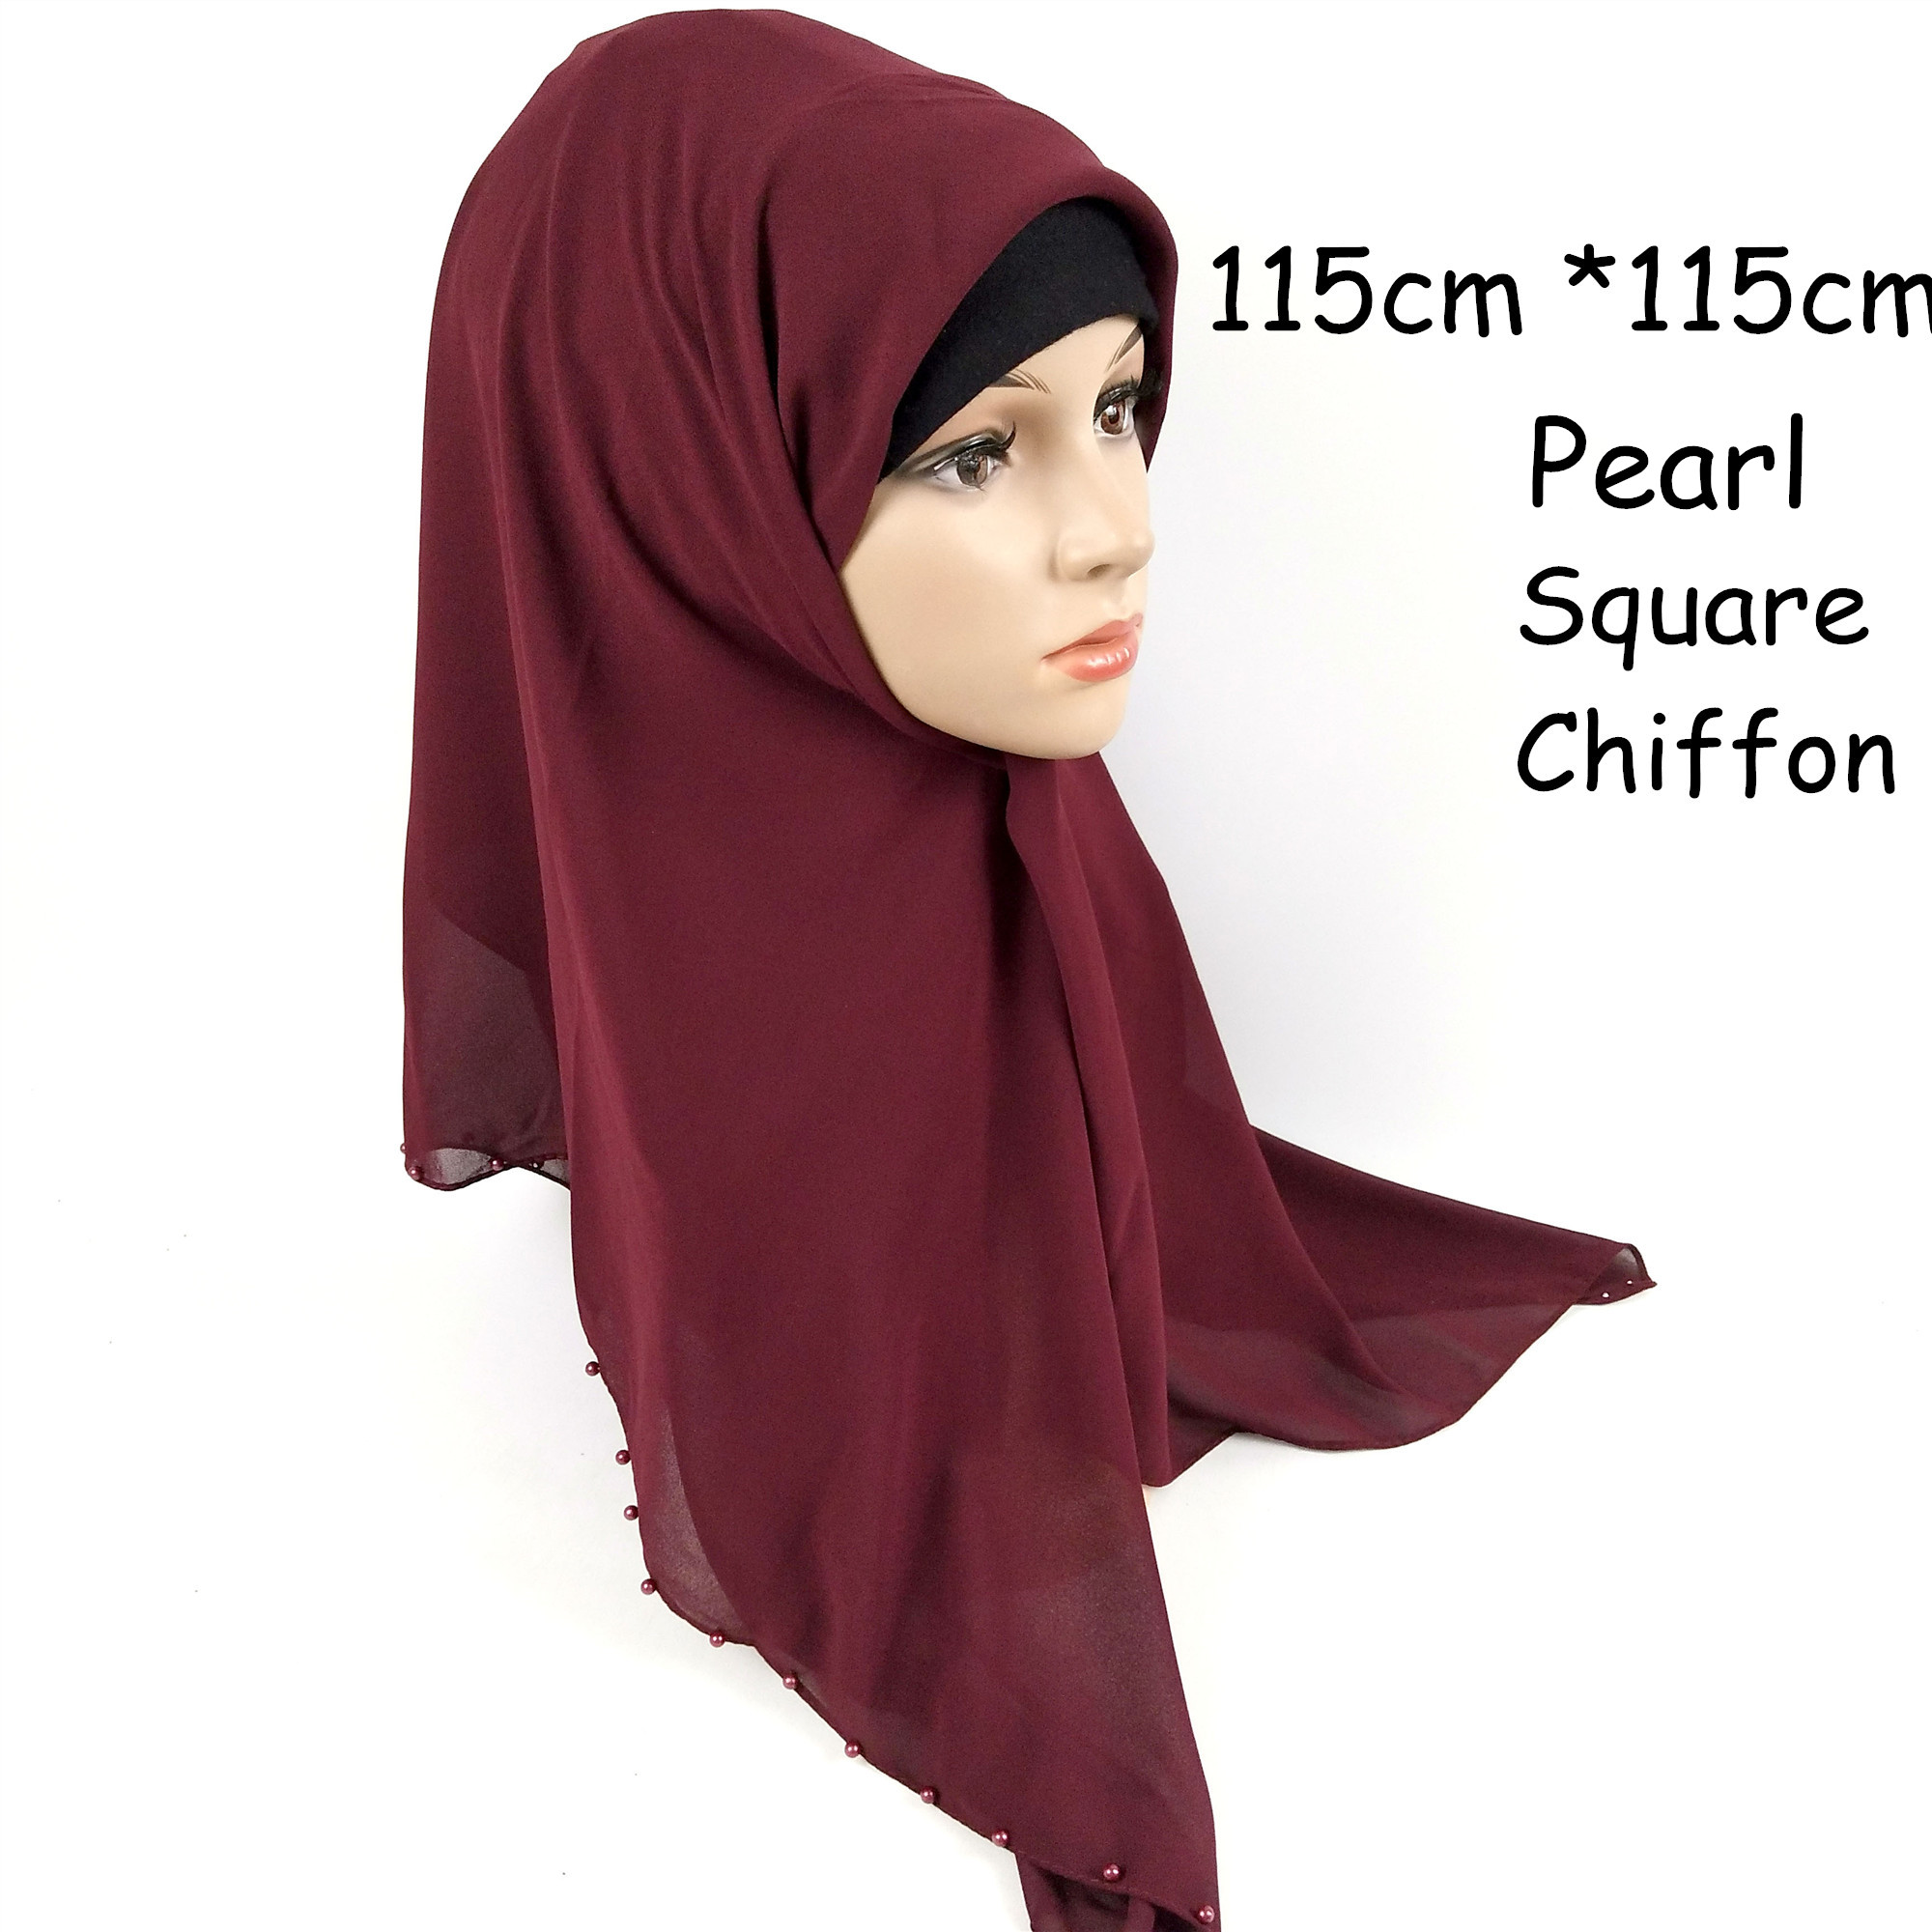 A8 High quality Pearl Square chiffon hijab   scarf   shawl 115 *115cm women   scarf  /  scarves     wrap   headband 10pcs/lot